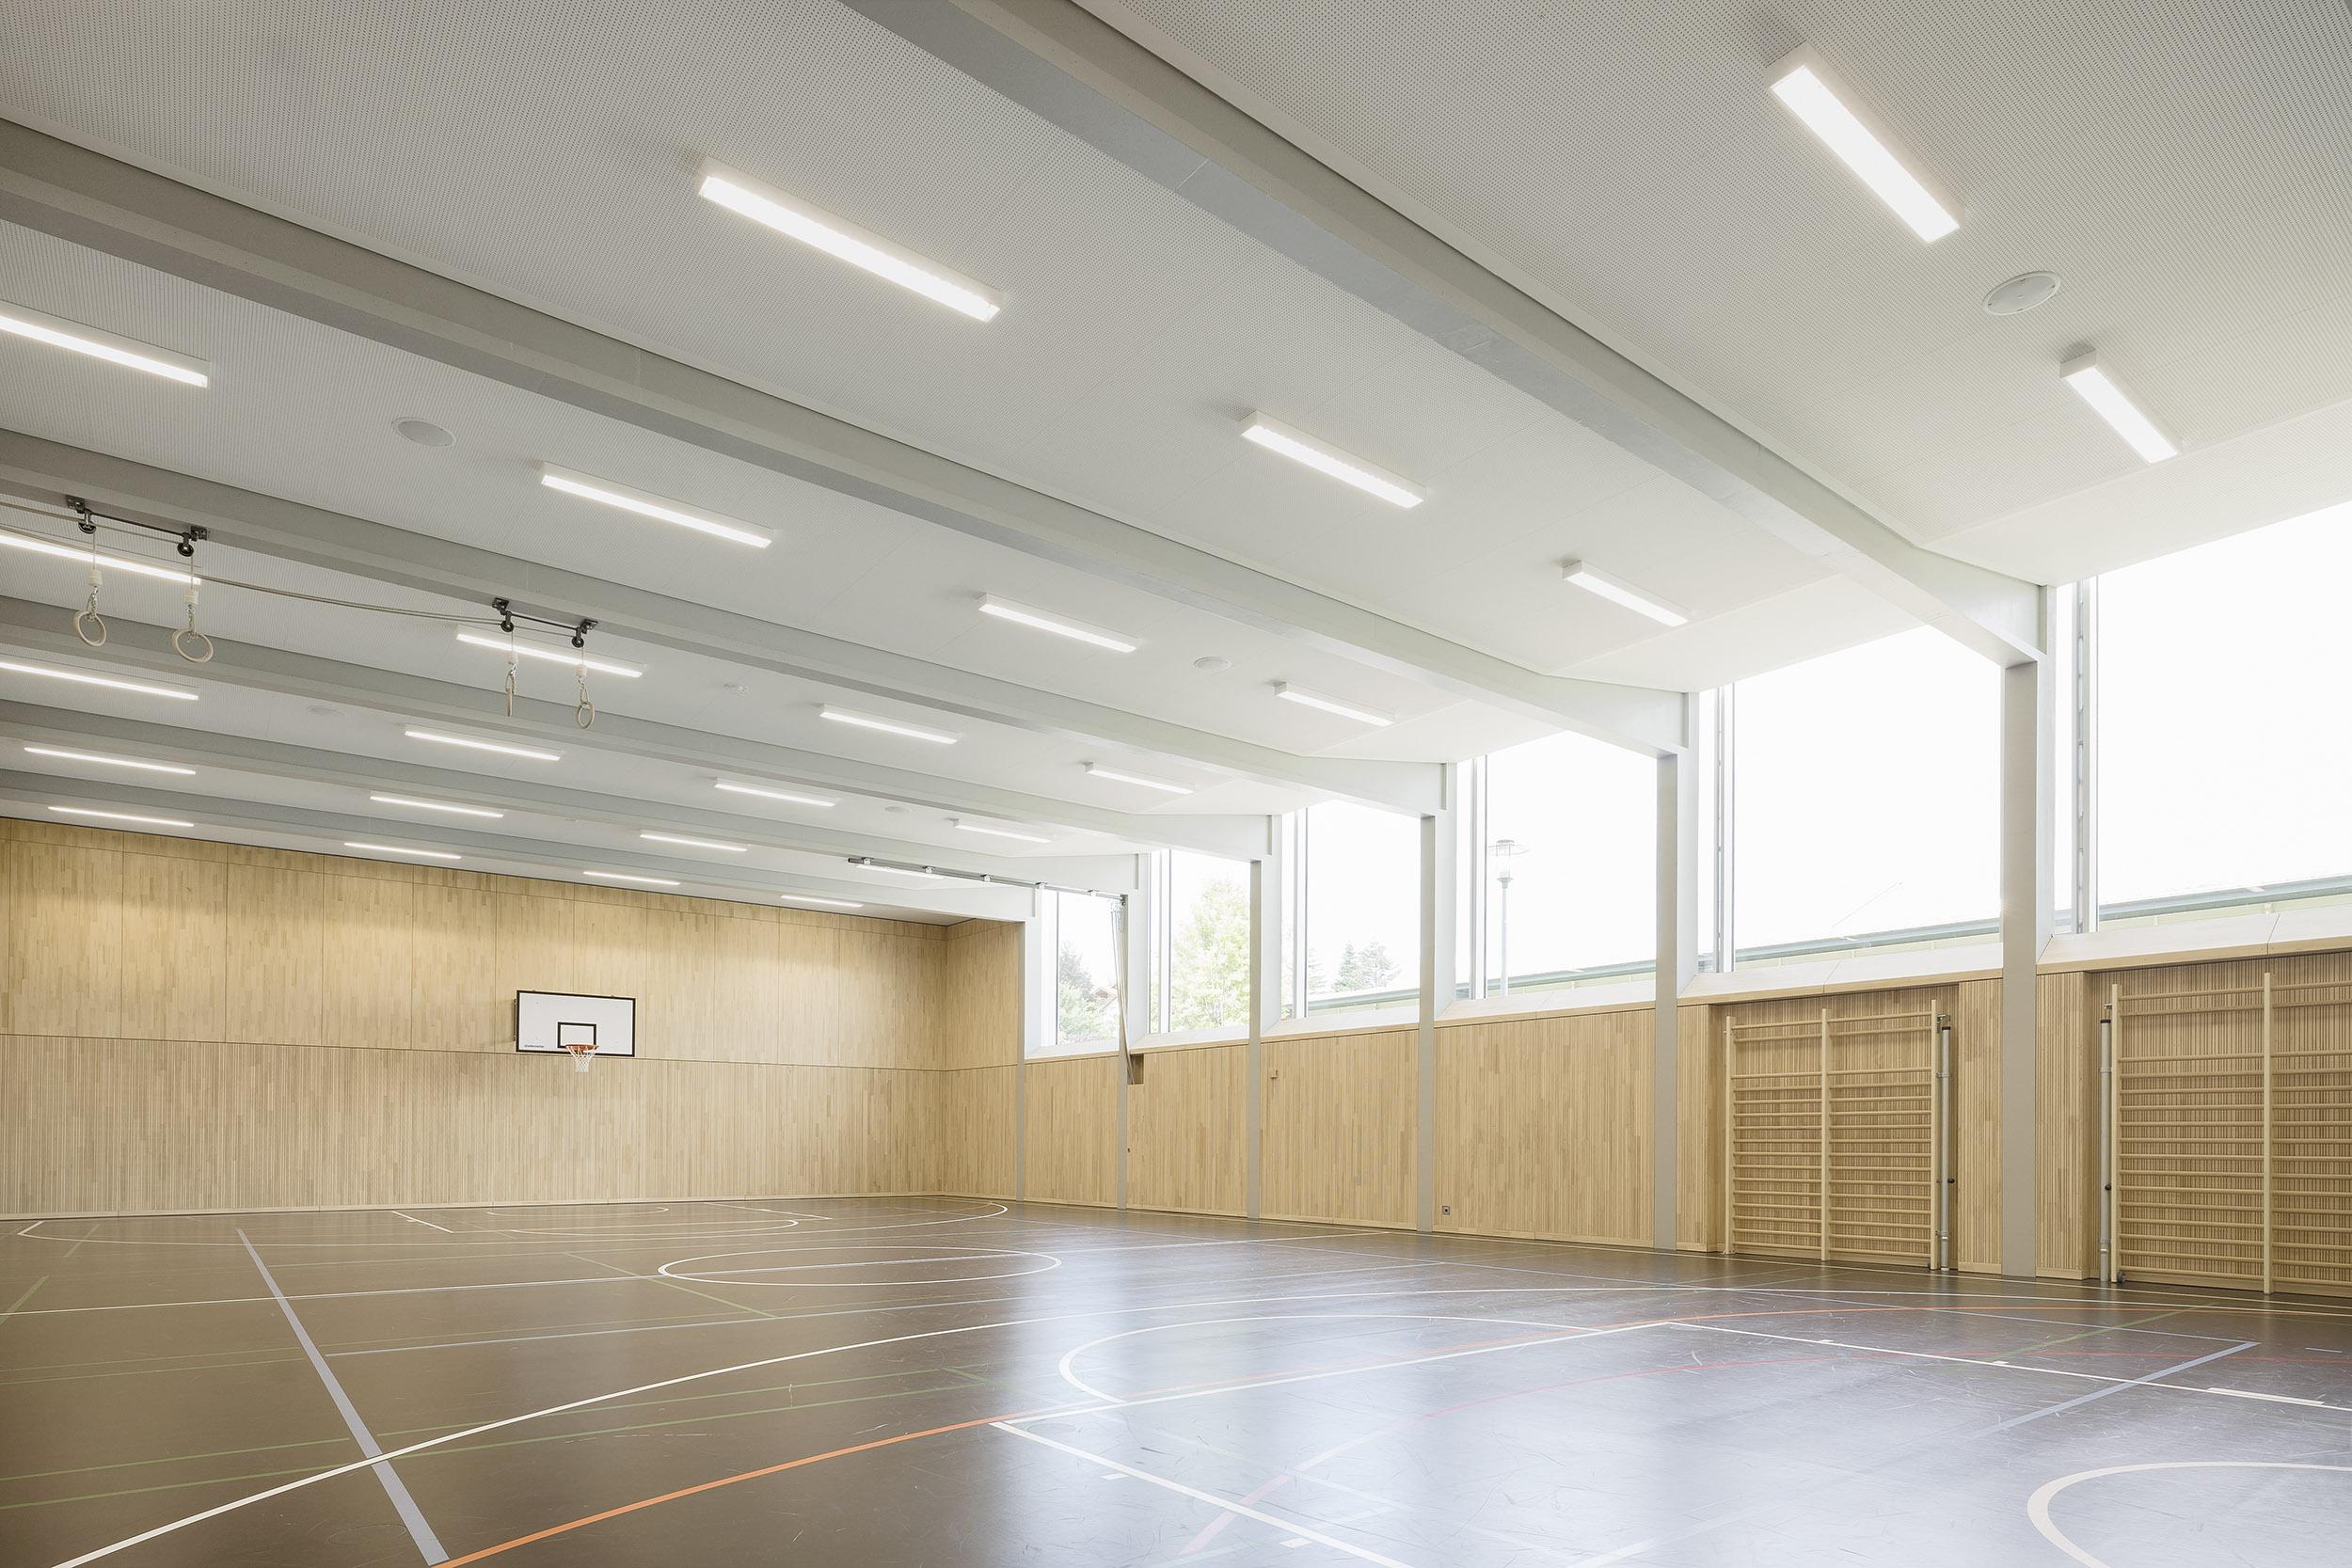 kaestle&ocker - Turnhalle Theodor-Heuss-Gymnasium